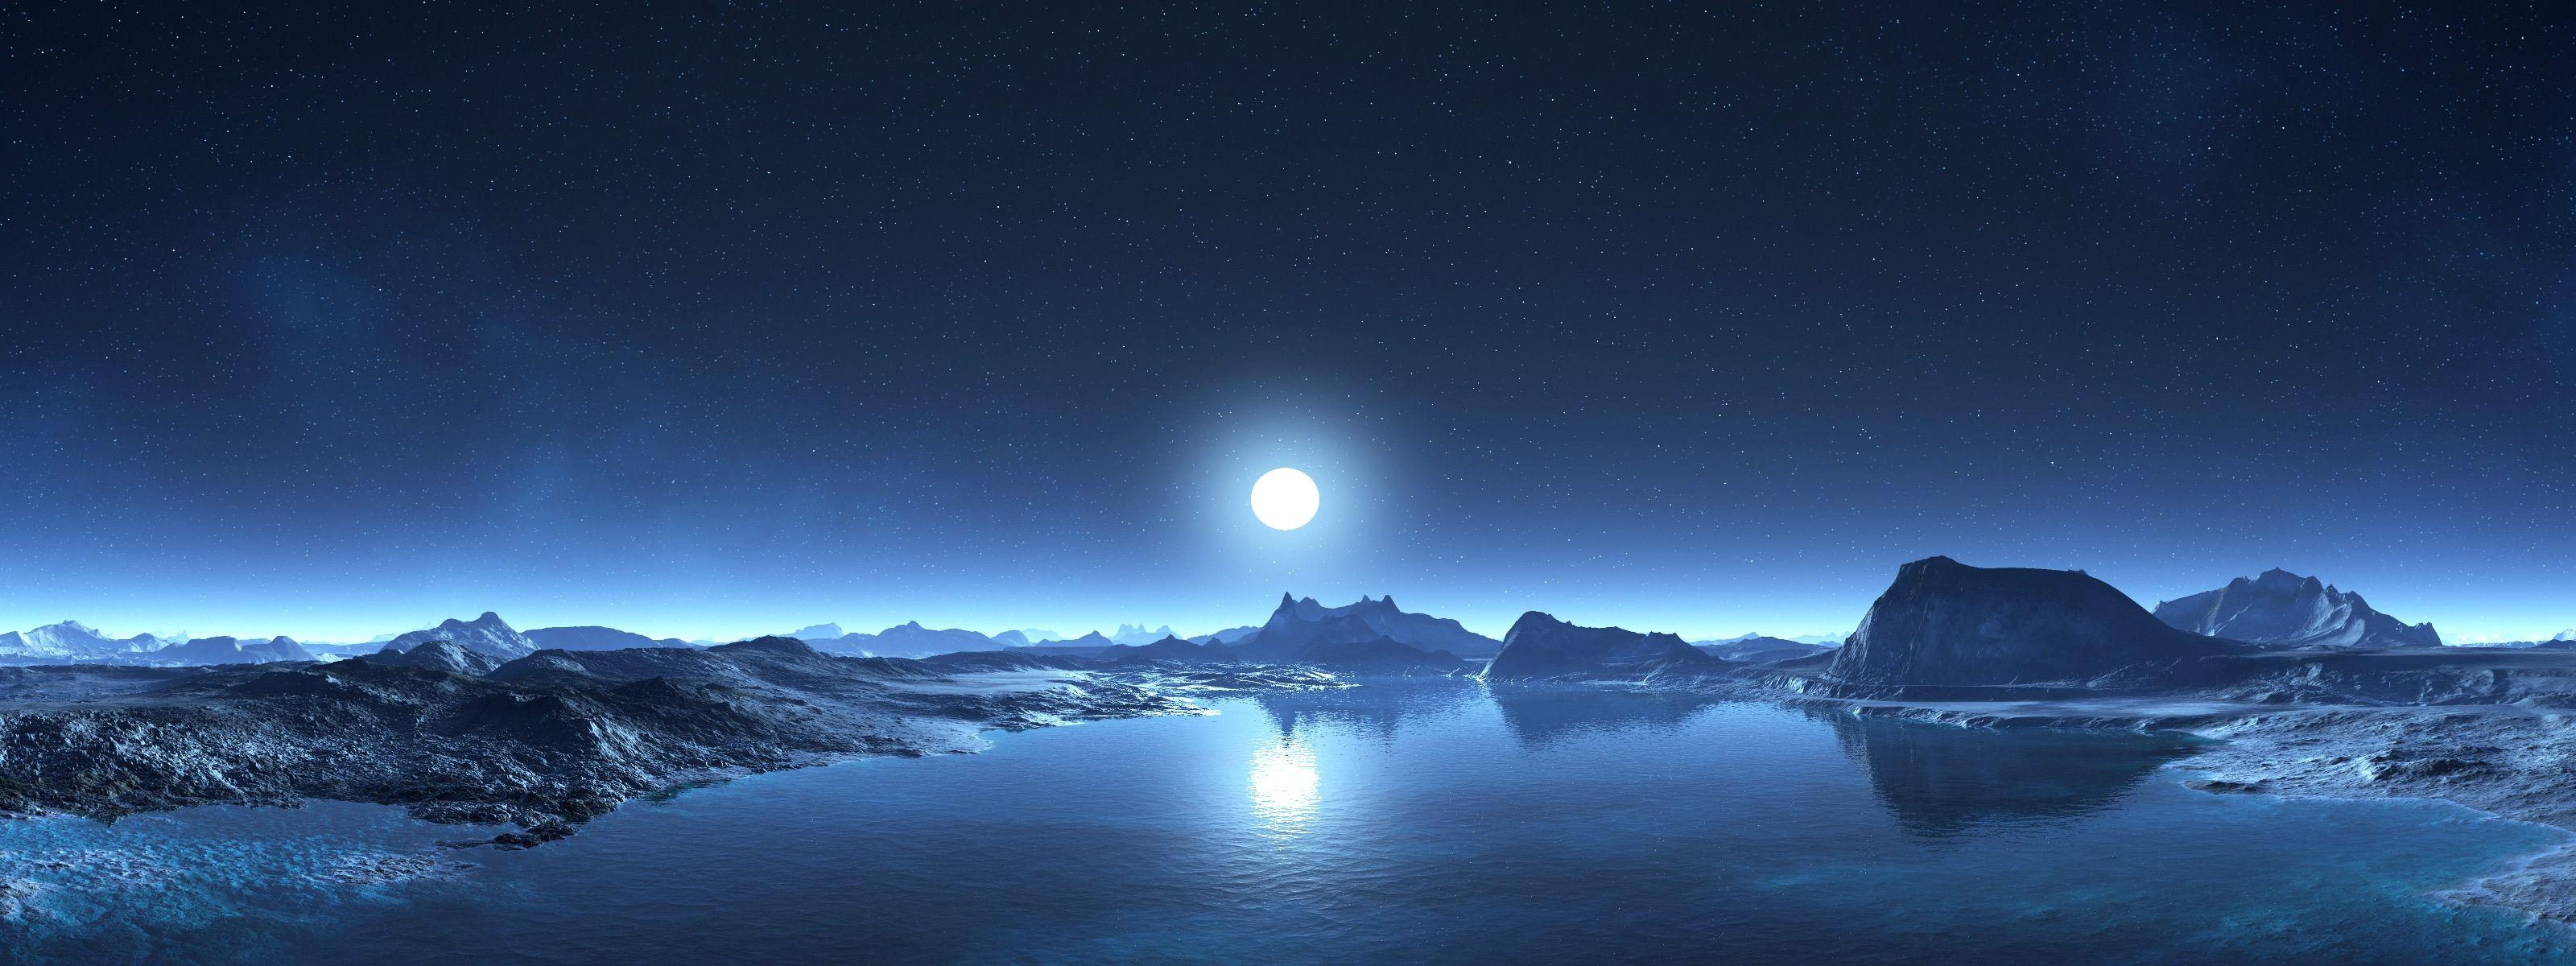 Night Moon Lake Hills Mountain Sci Fi Stars Sky Digital Art Fantasy 6724 Jpg 3200 1200 Background Images Dual Monitor Wallpaper Sky Digital